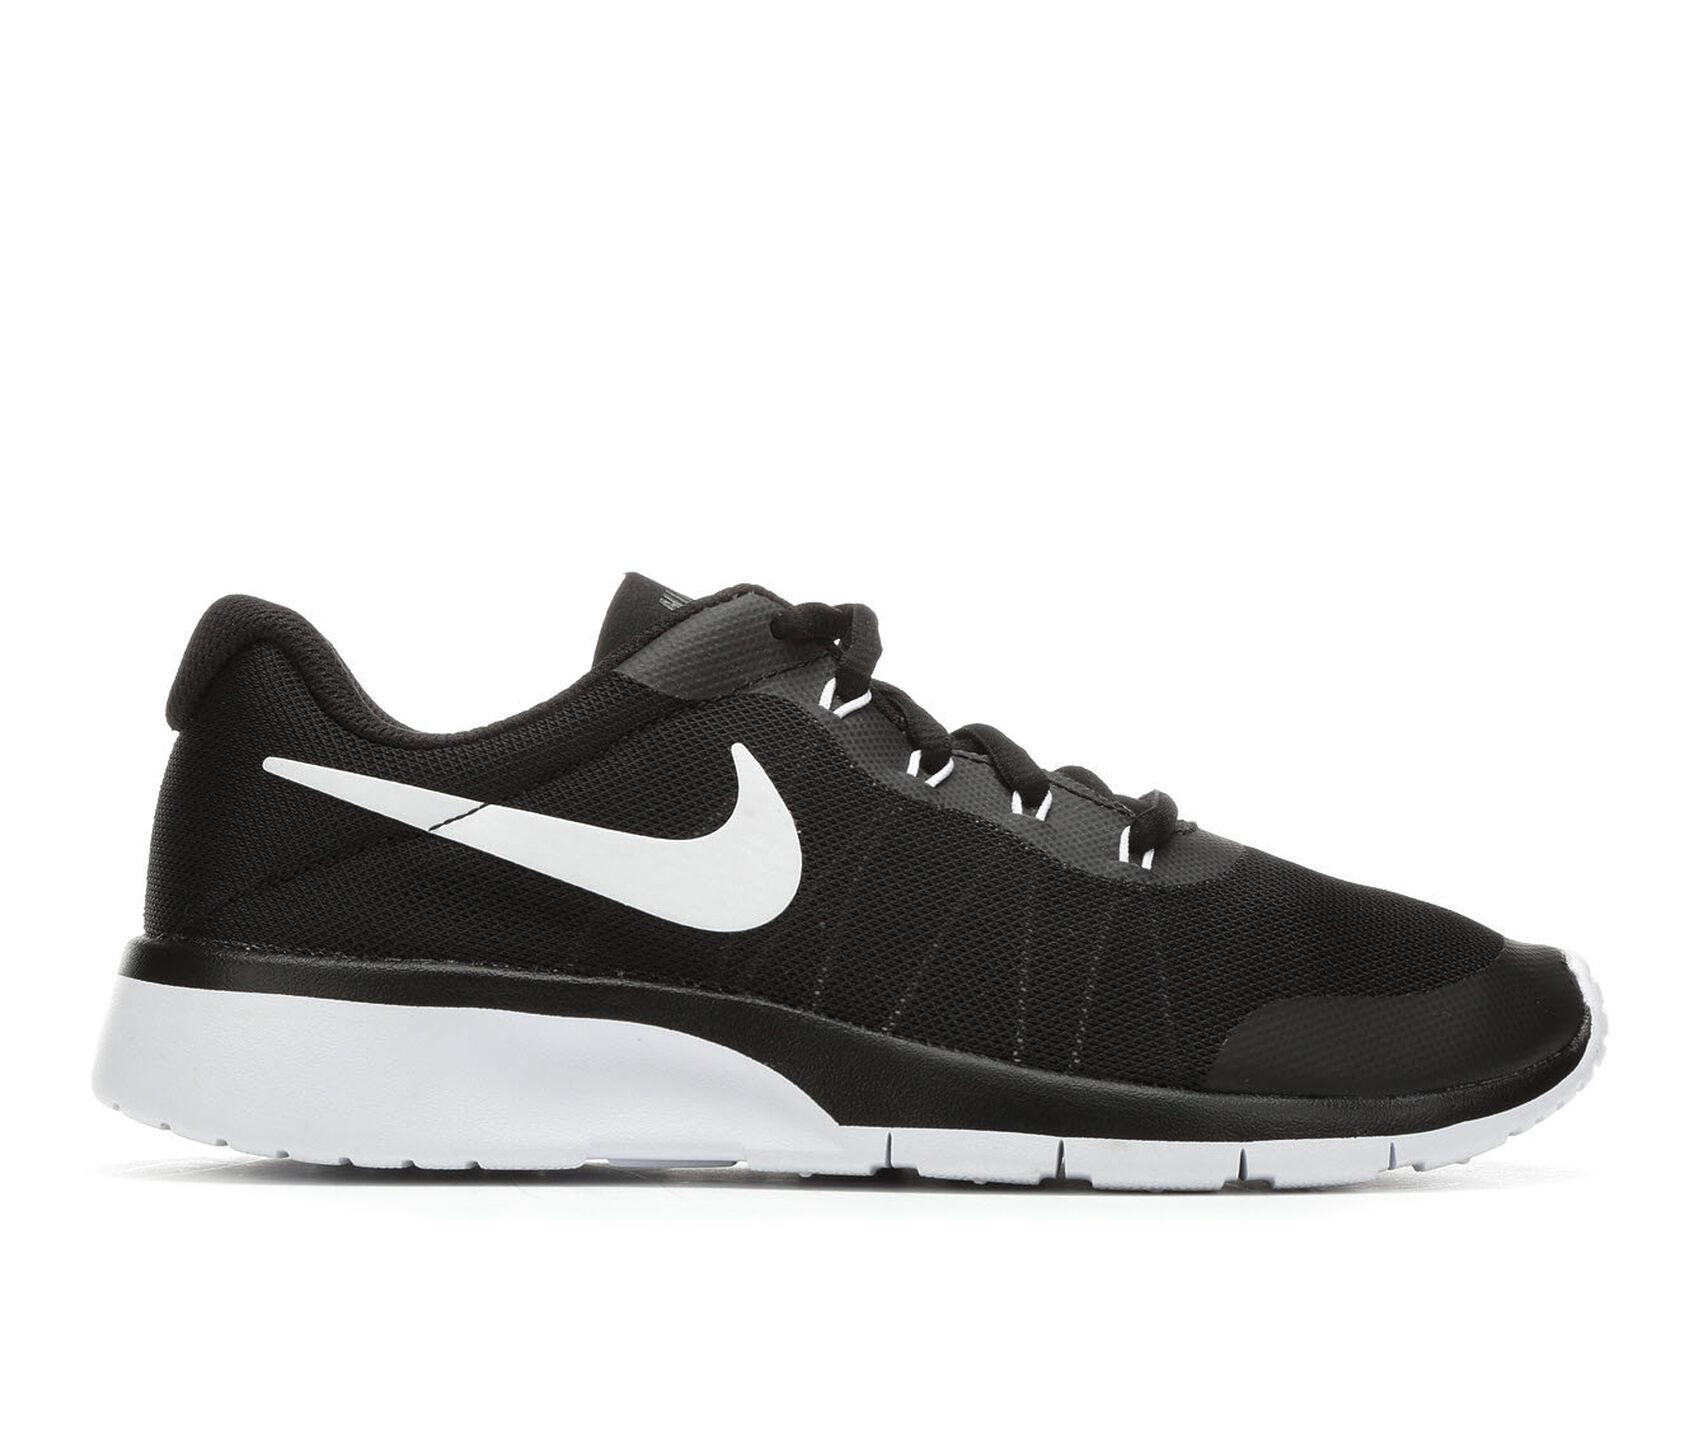 b5581aab7d681 Images. Kids' Nike Tanjun Racer 3.5-7 Running Shoes